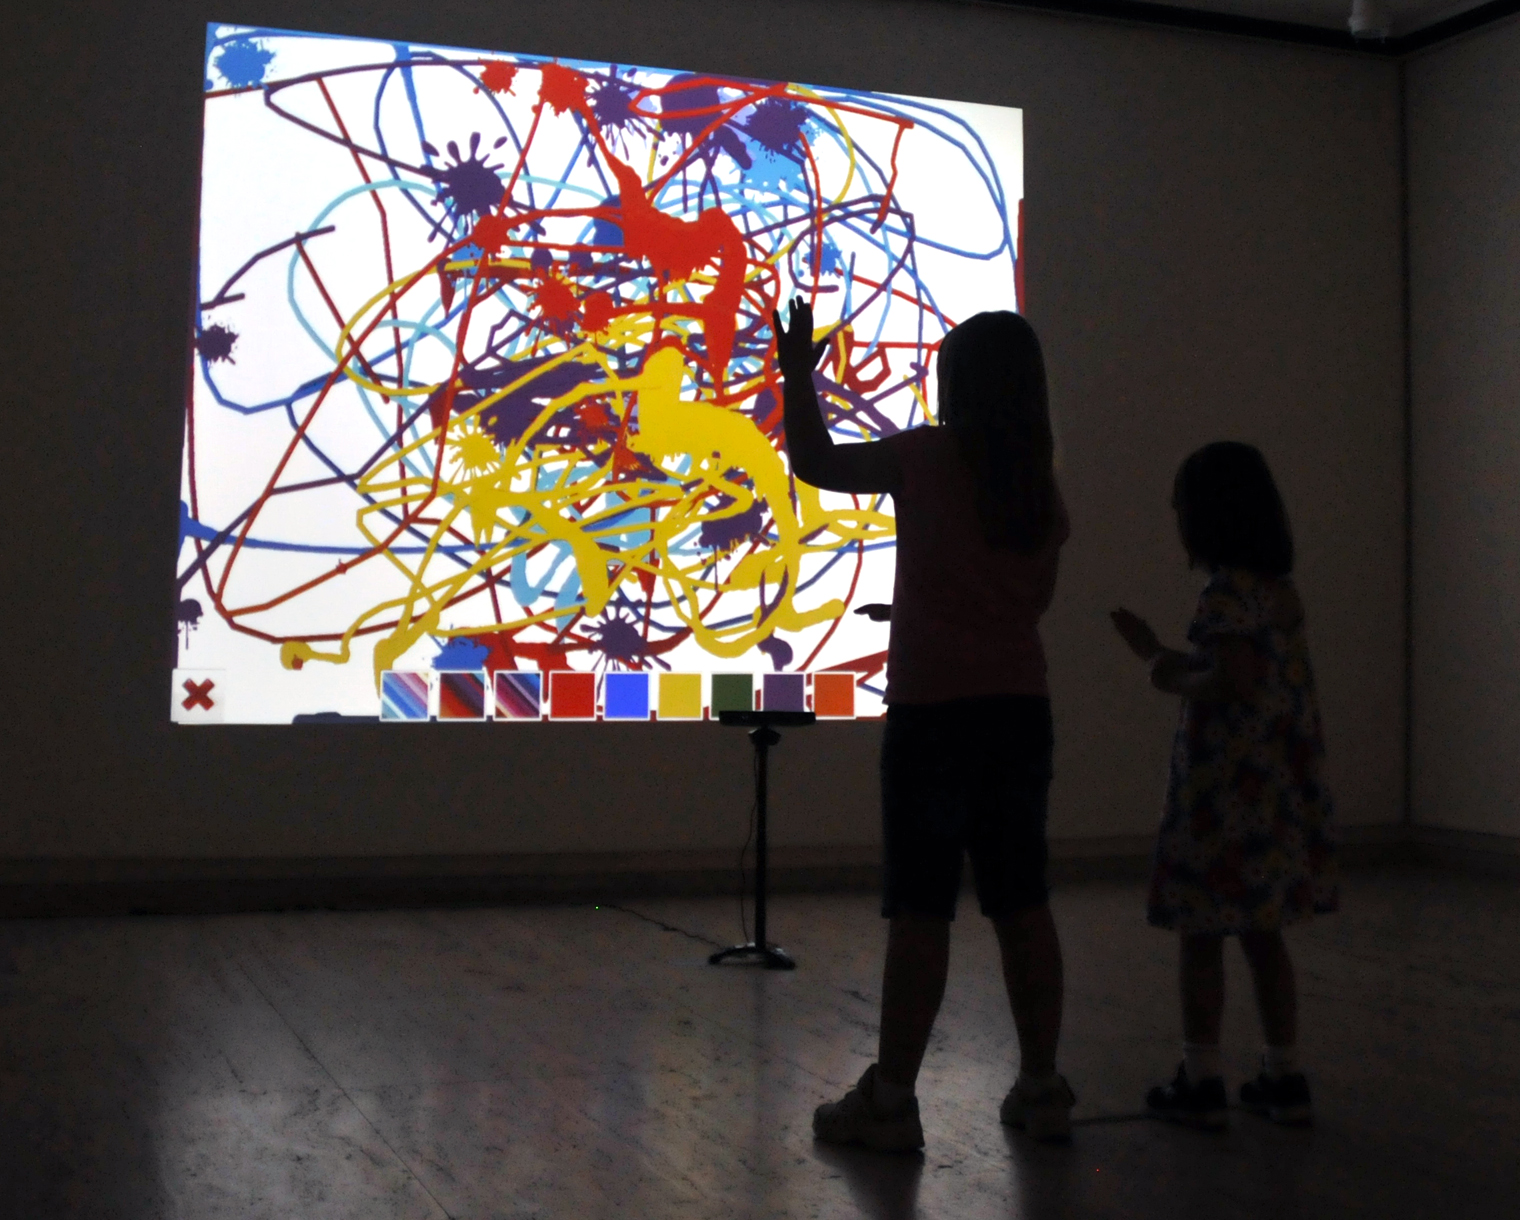 Sarma Students Develop Interactive Art Project Nebraska